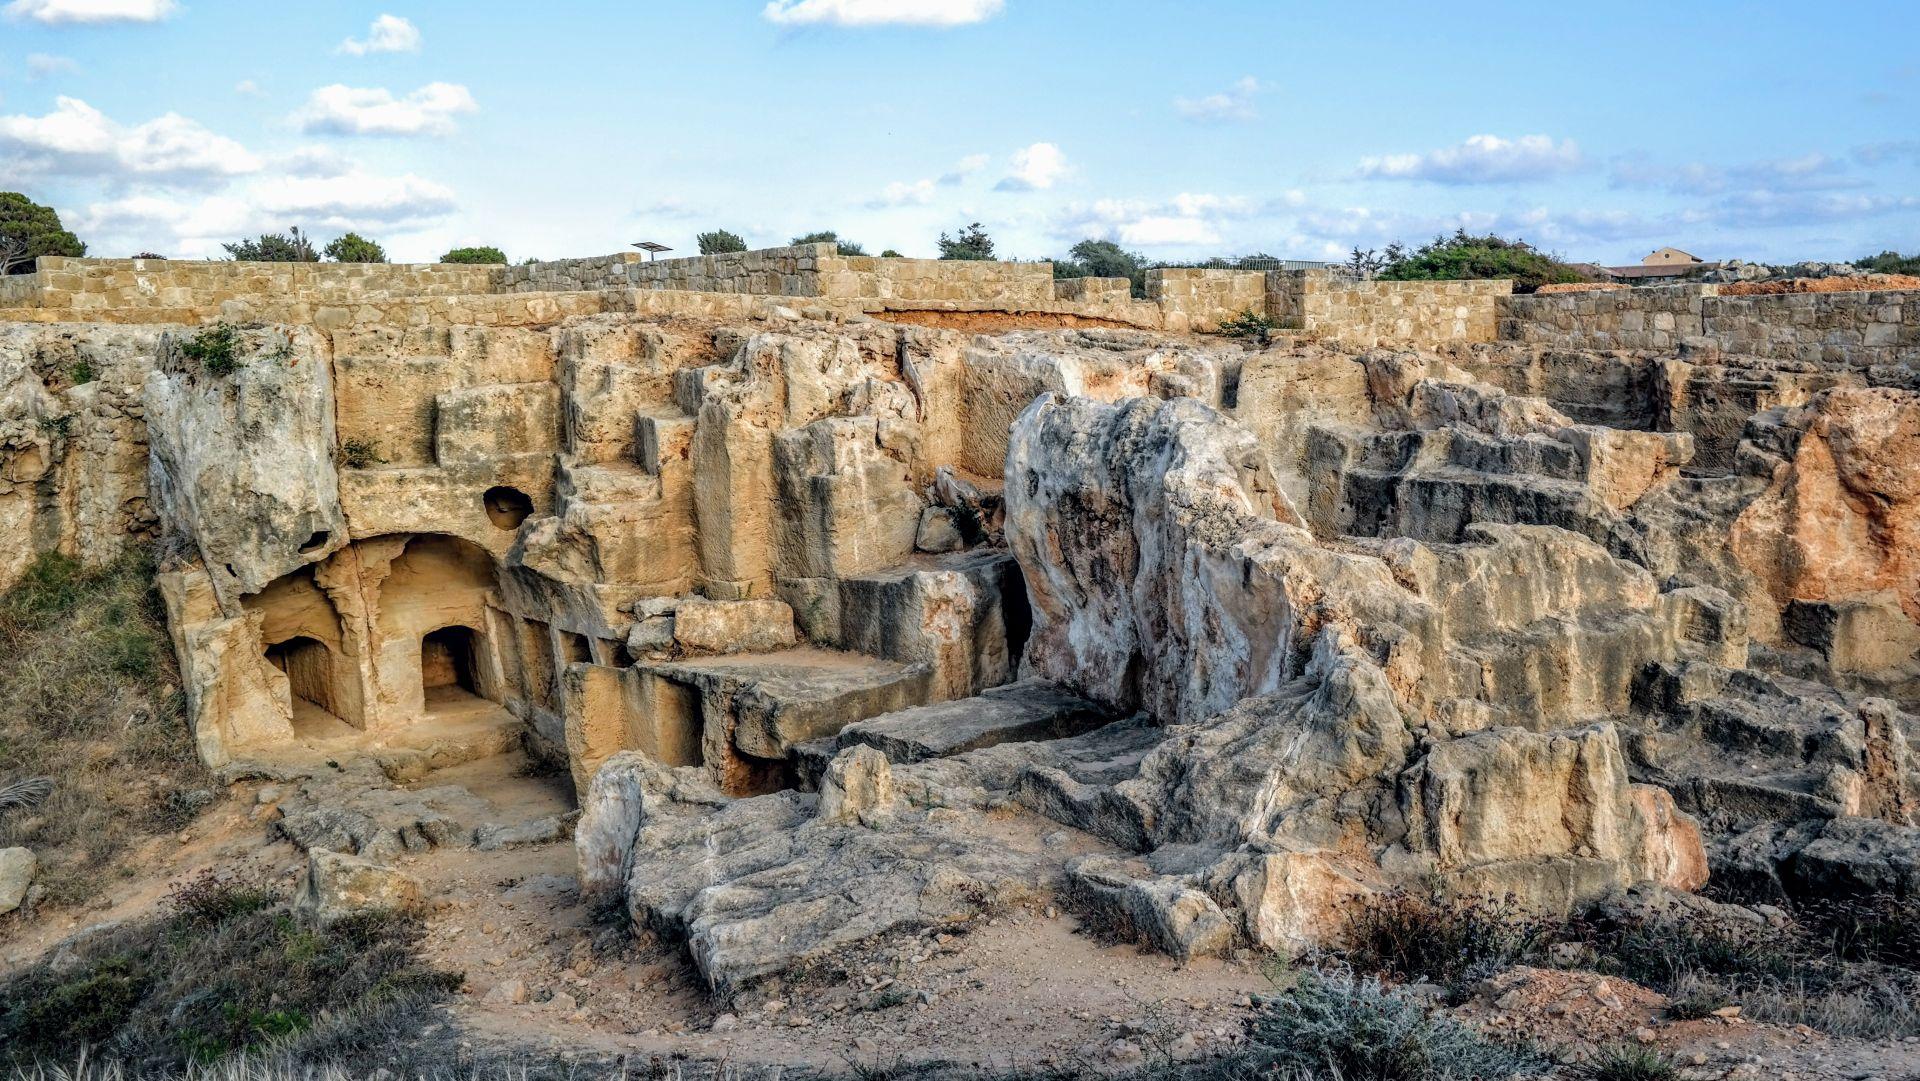 Cypr - Grobowce Królów